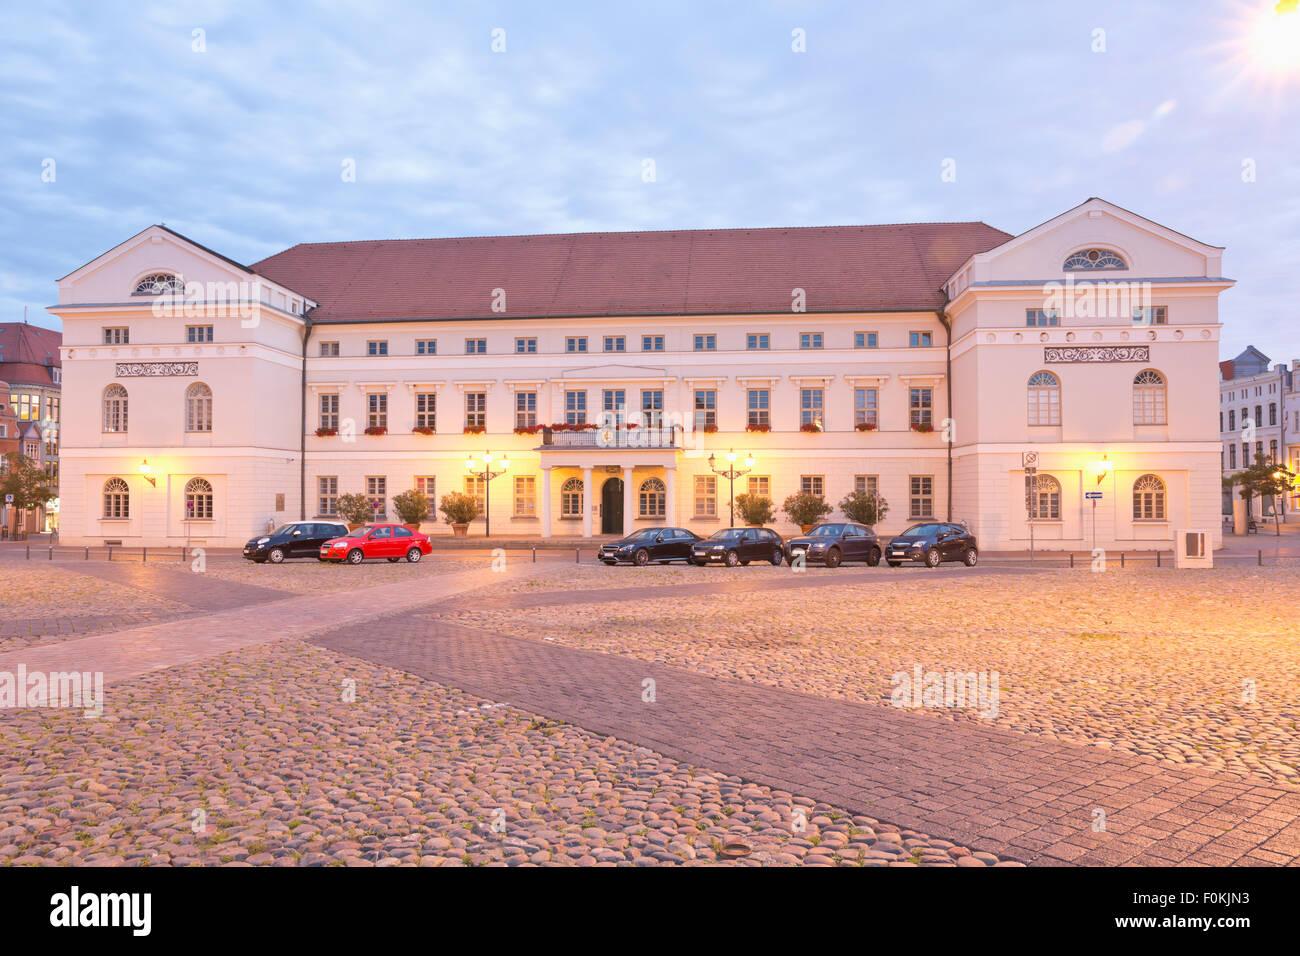 Germany, Wismar, city hall at twilight - Stock Image